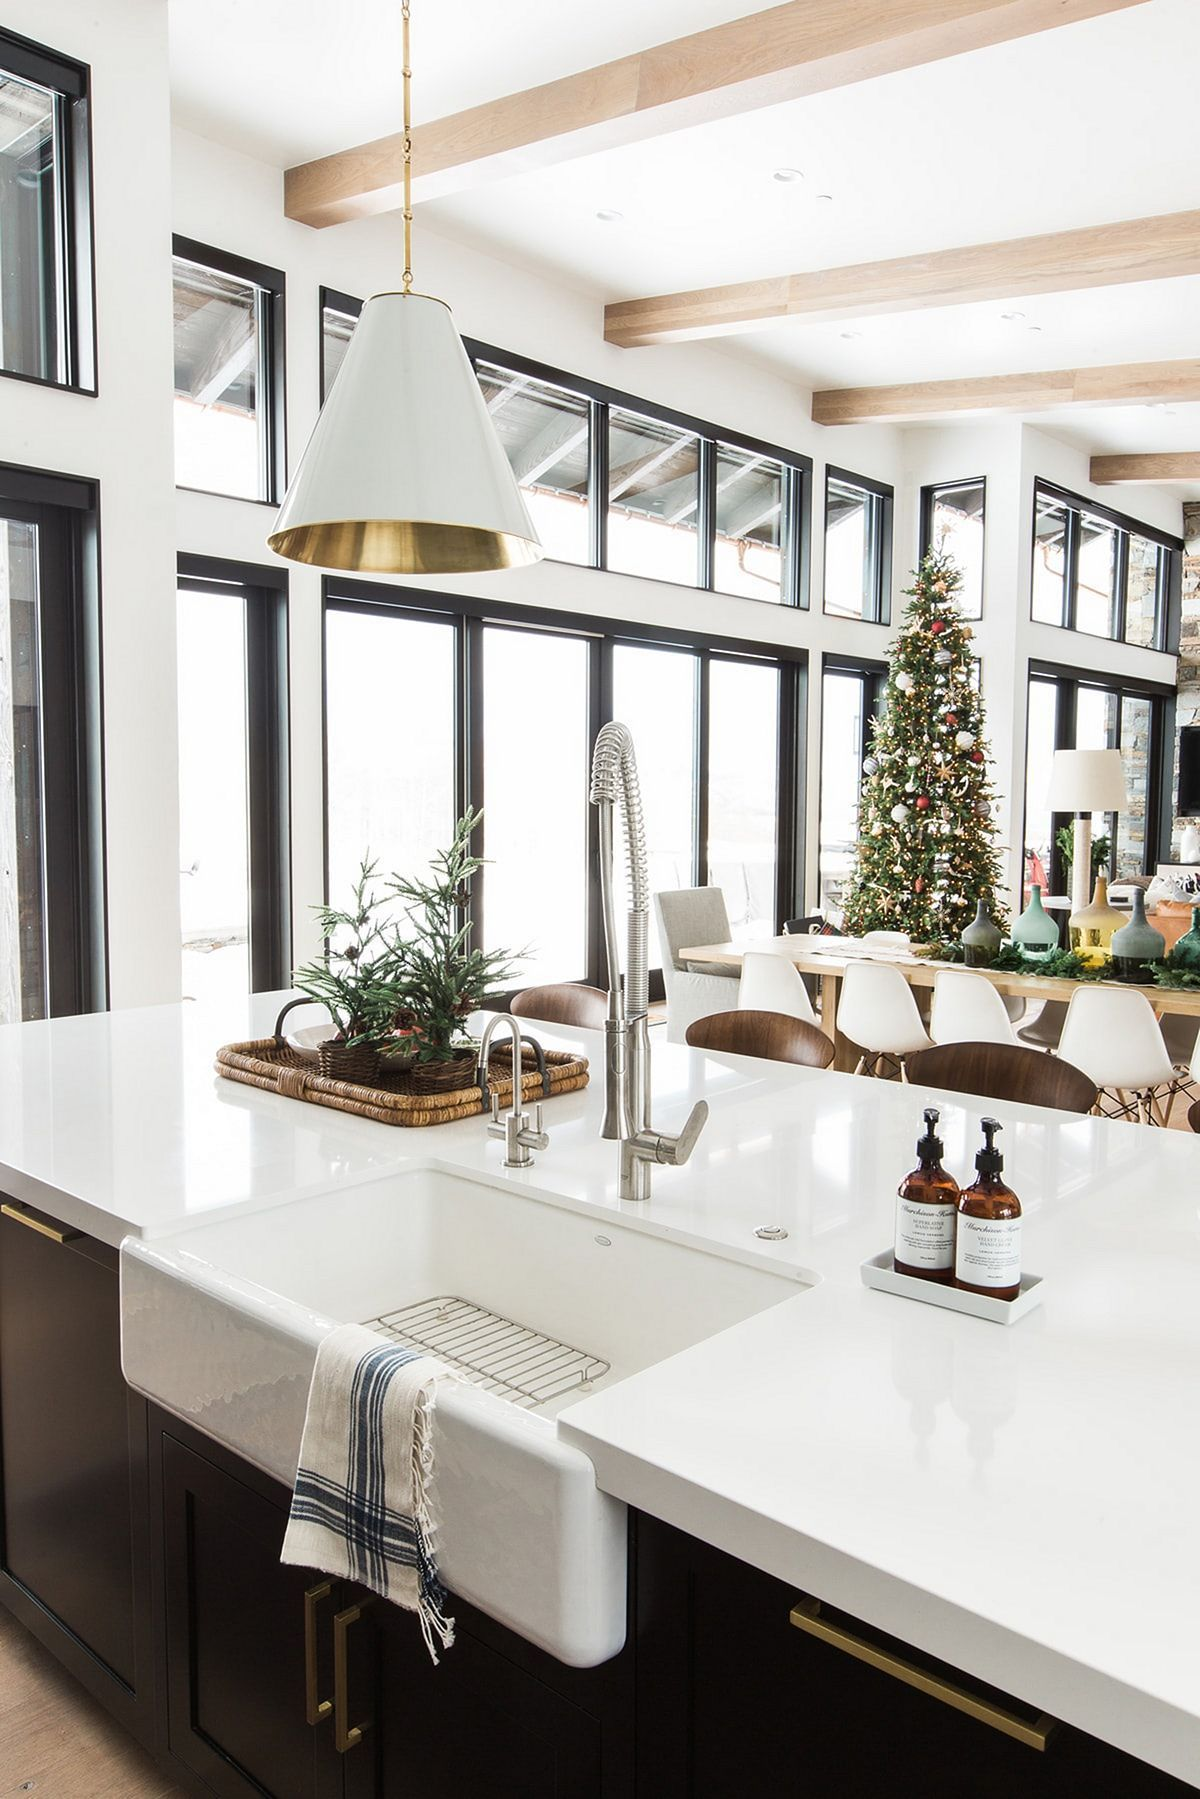 34 beautiful modern farmhouse kitchen sink designs beautiful home rh pinterest com Vintage Double Drainboard Kitchen Sink Small Kitchen Designs